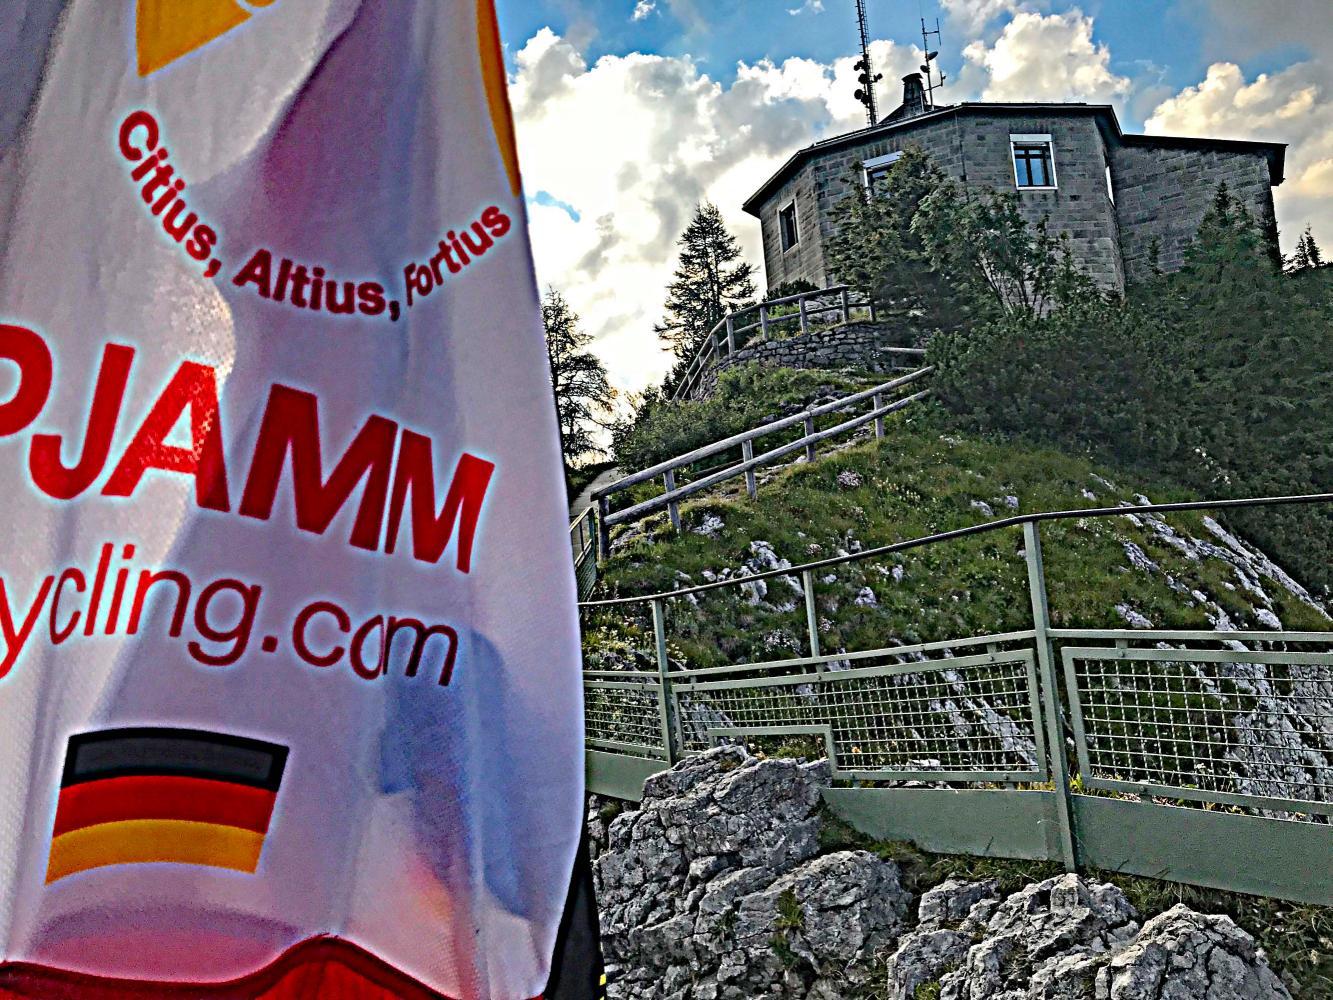 Kehlsteinhaus (Eagles Nest) Bike Climb - PJAMM Cycling